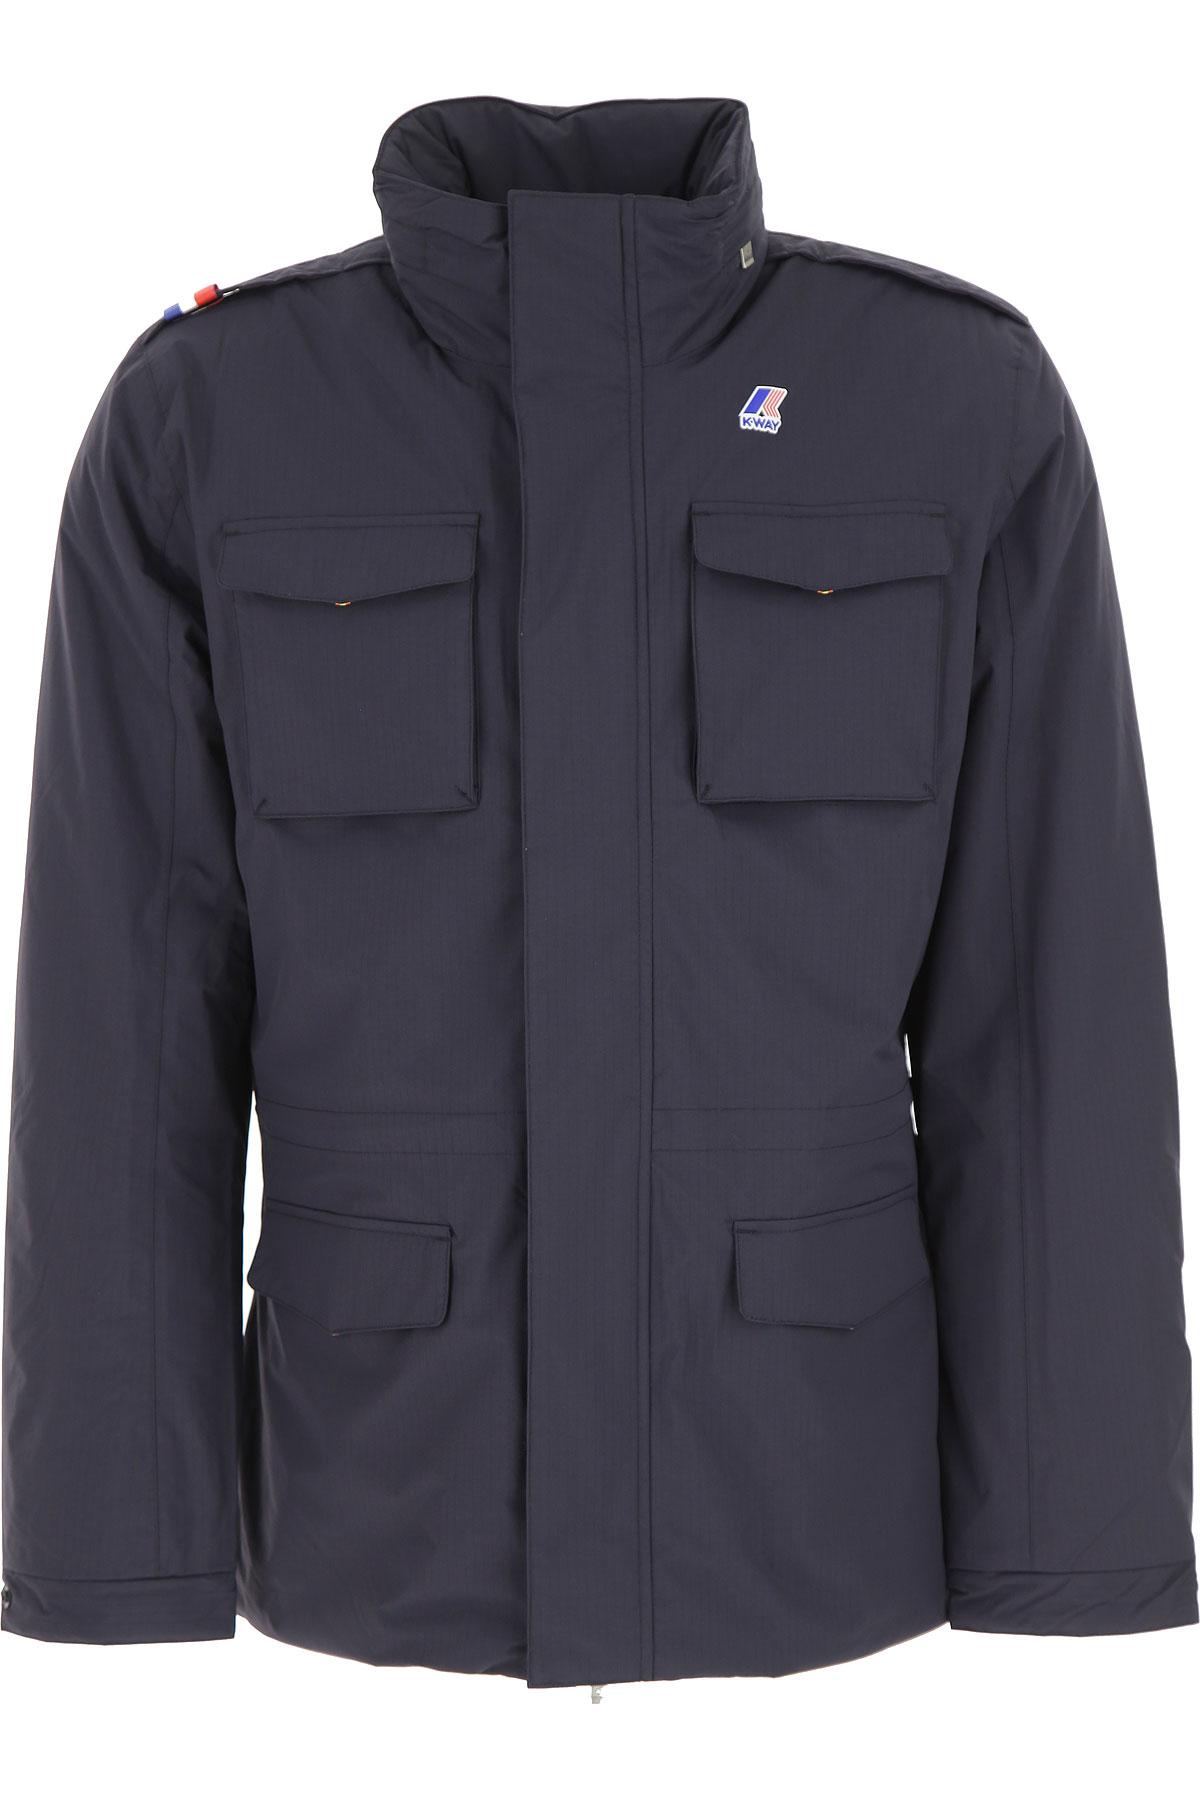 Image of K-Way Down Jacket for Men, Puffer Ski Jacket, Deep Blue Antracite, polyamide, 2017, L M XL